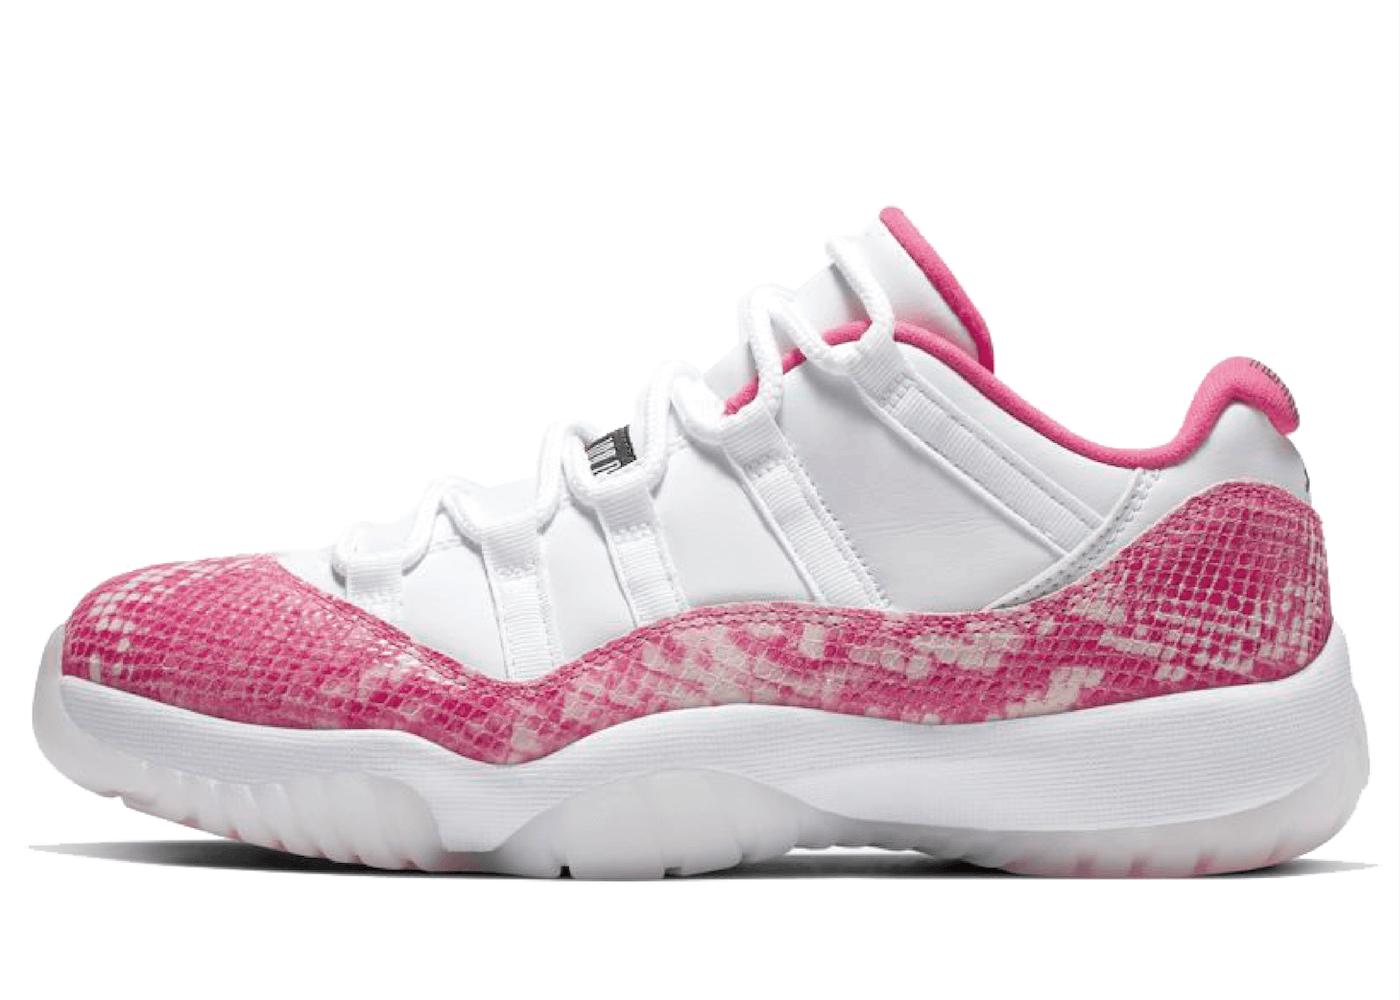 Nike Air Jordan 11 Retro Low Pink Snakeskin Womens (2019)の写真